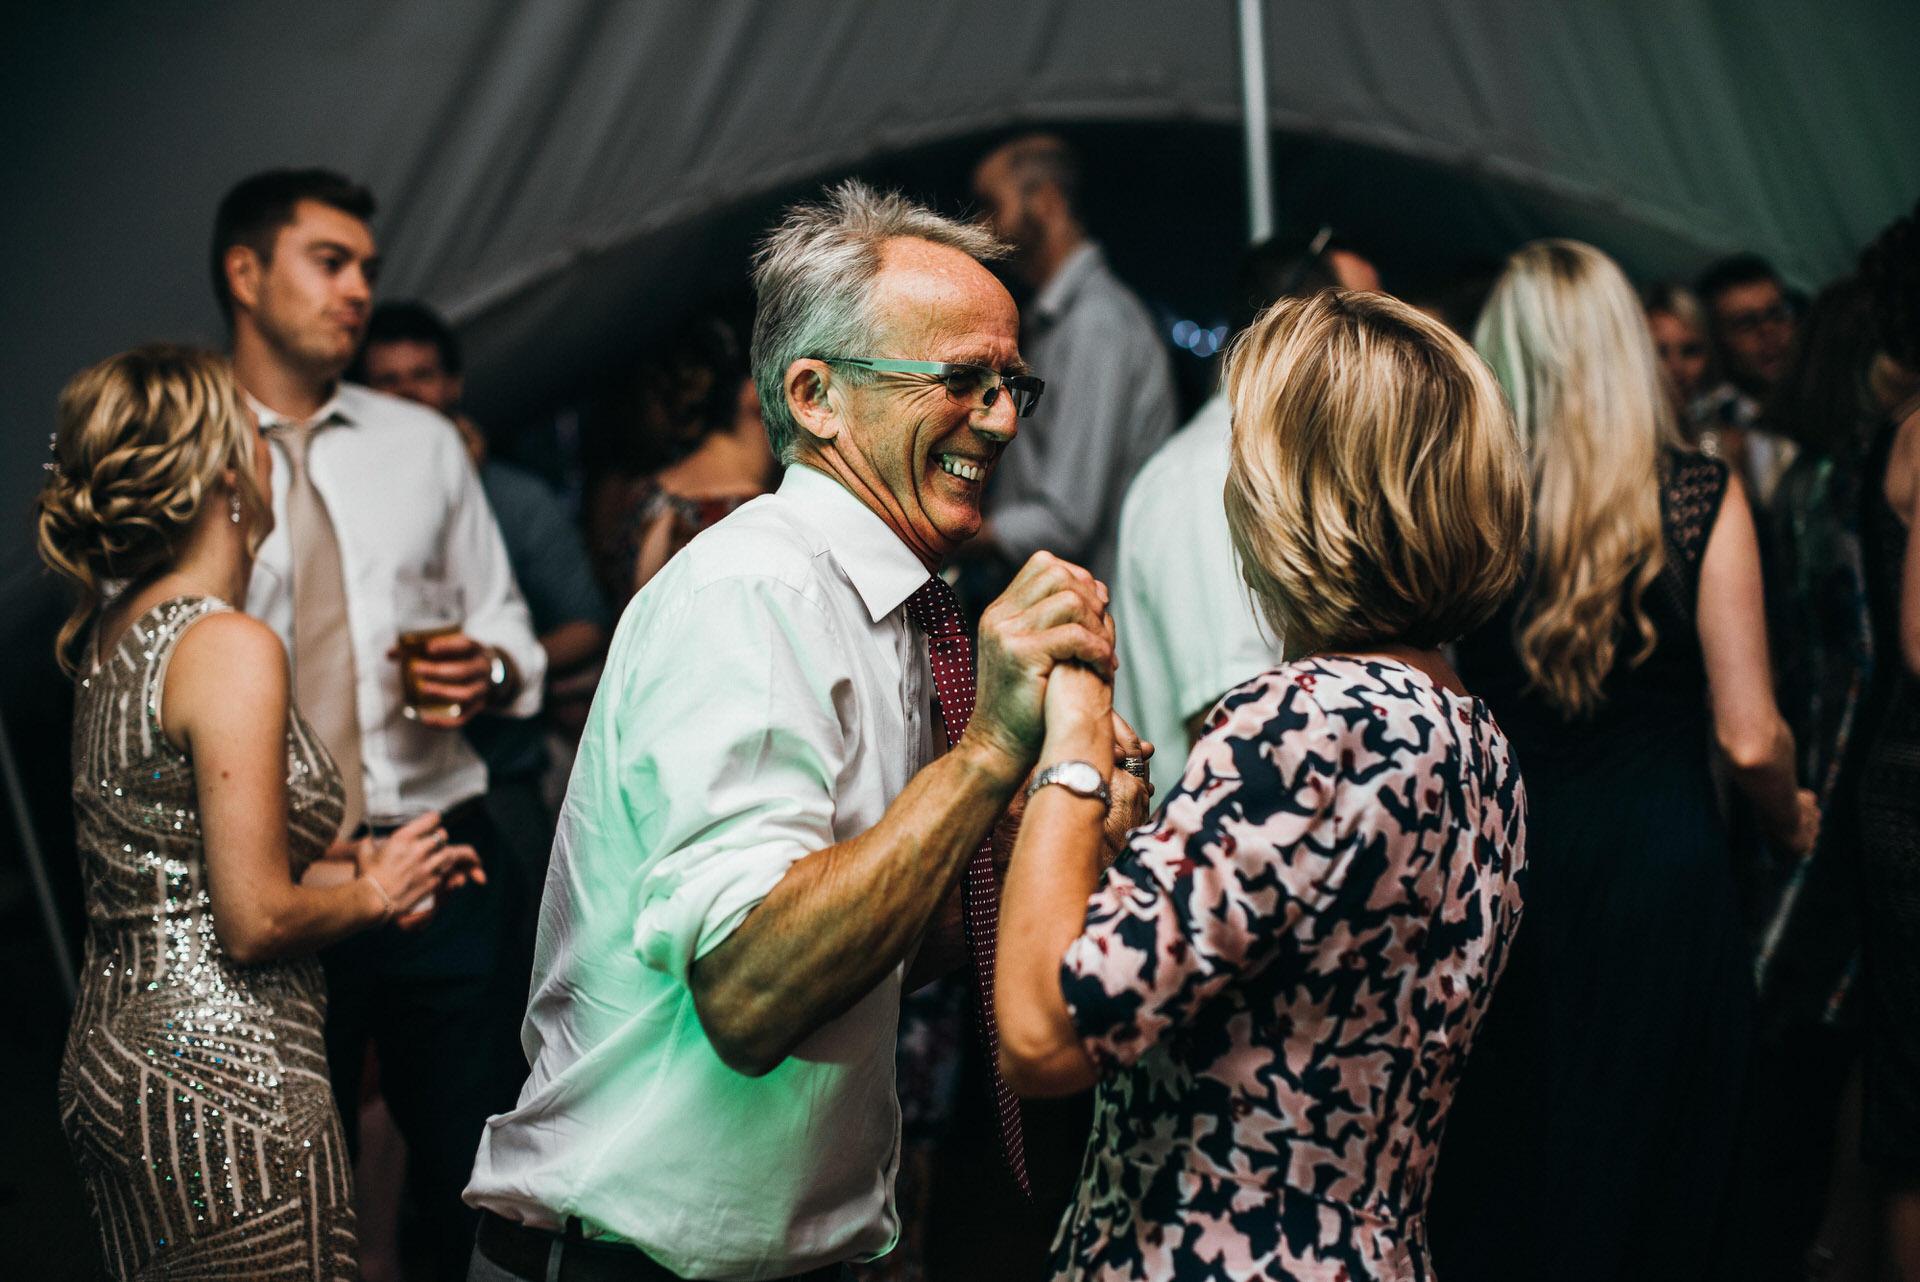 dancing at wedding RHS Wisely